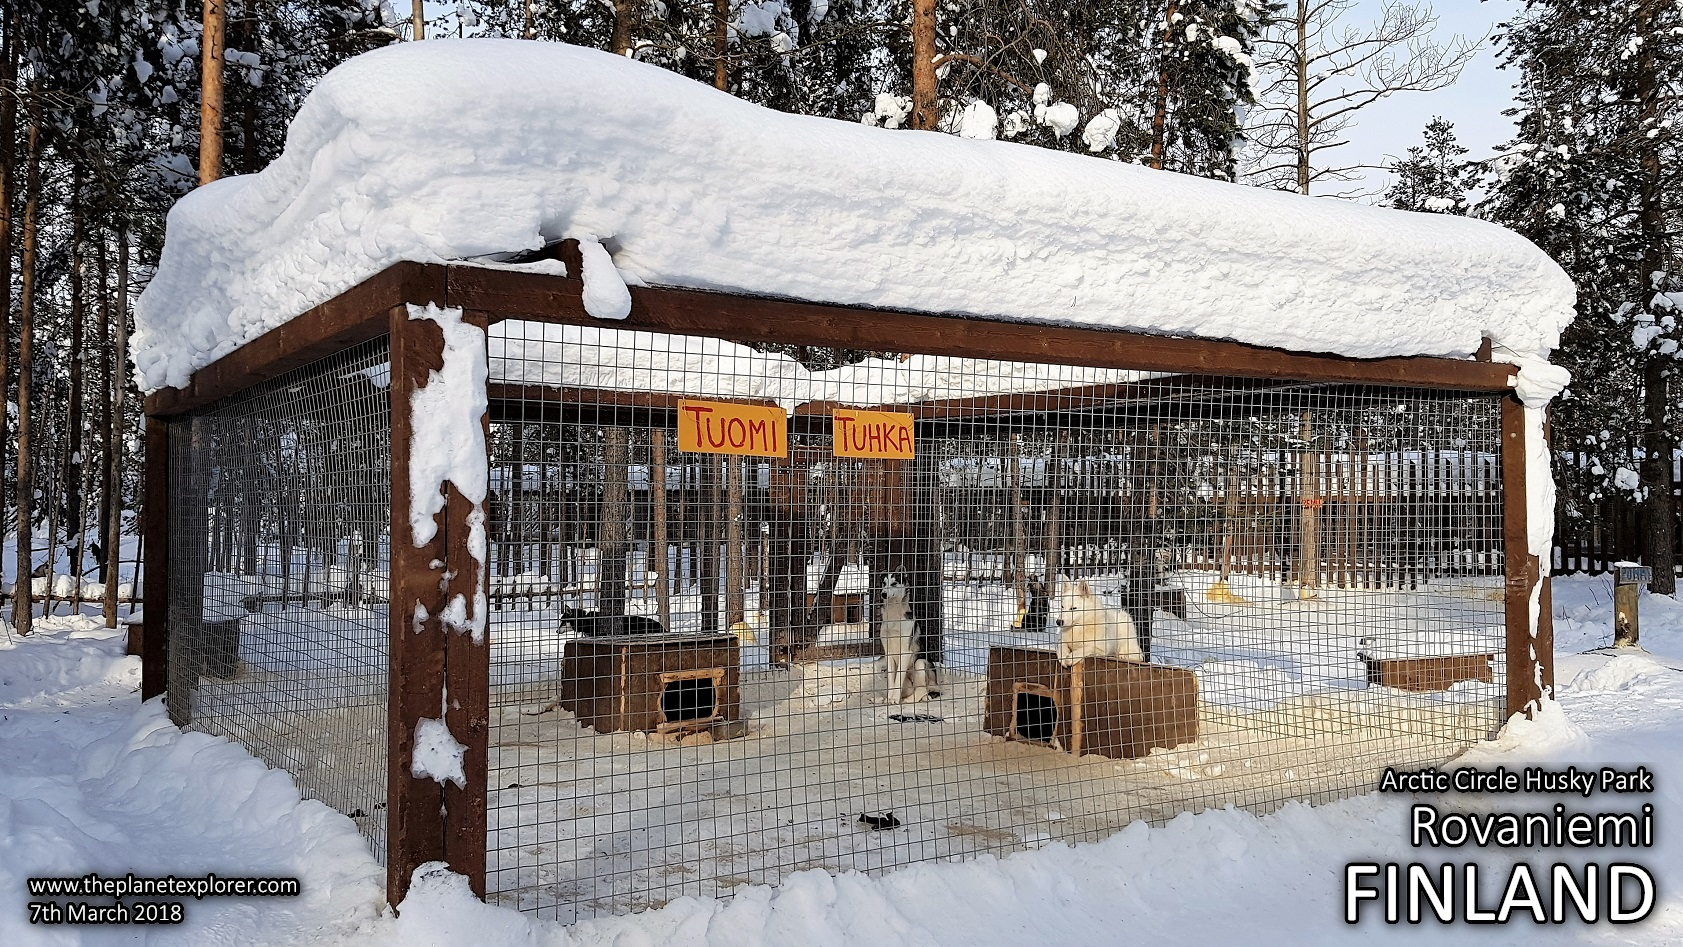 20180307_1451_Finland_Rovaniemi_Arctic Circle Husky Park_Samsung Note 8_LR_@www